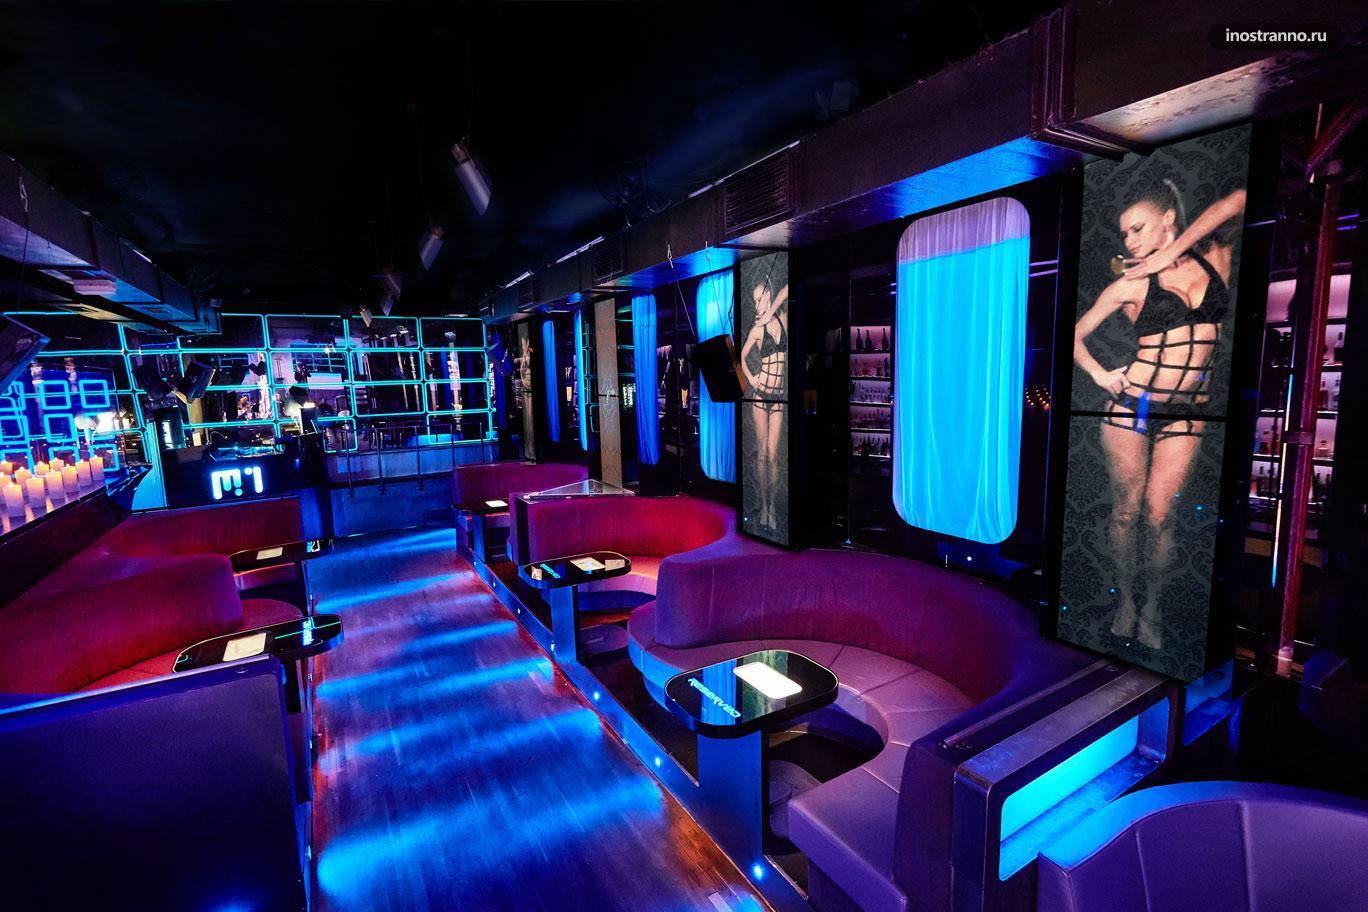 M1 Lounge Bar & Club Прага кальян